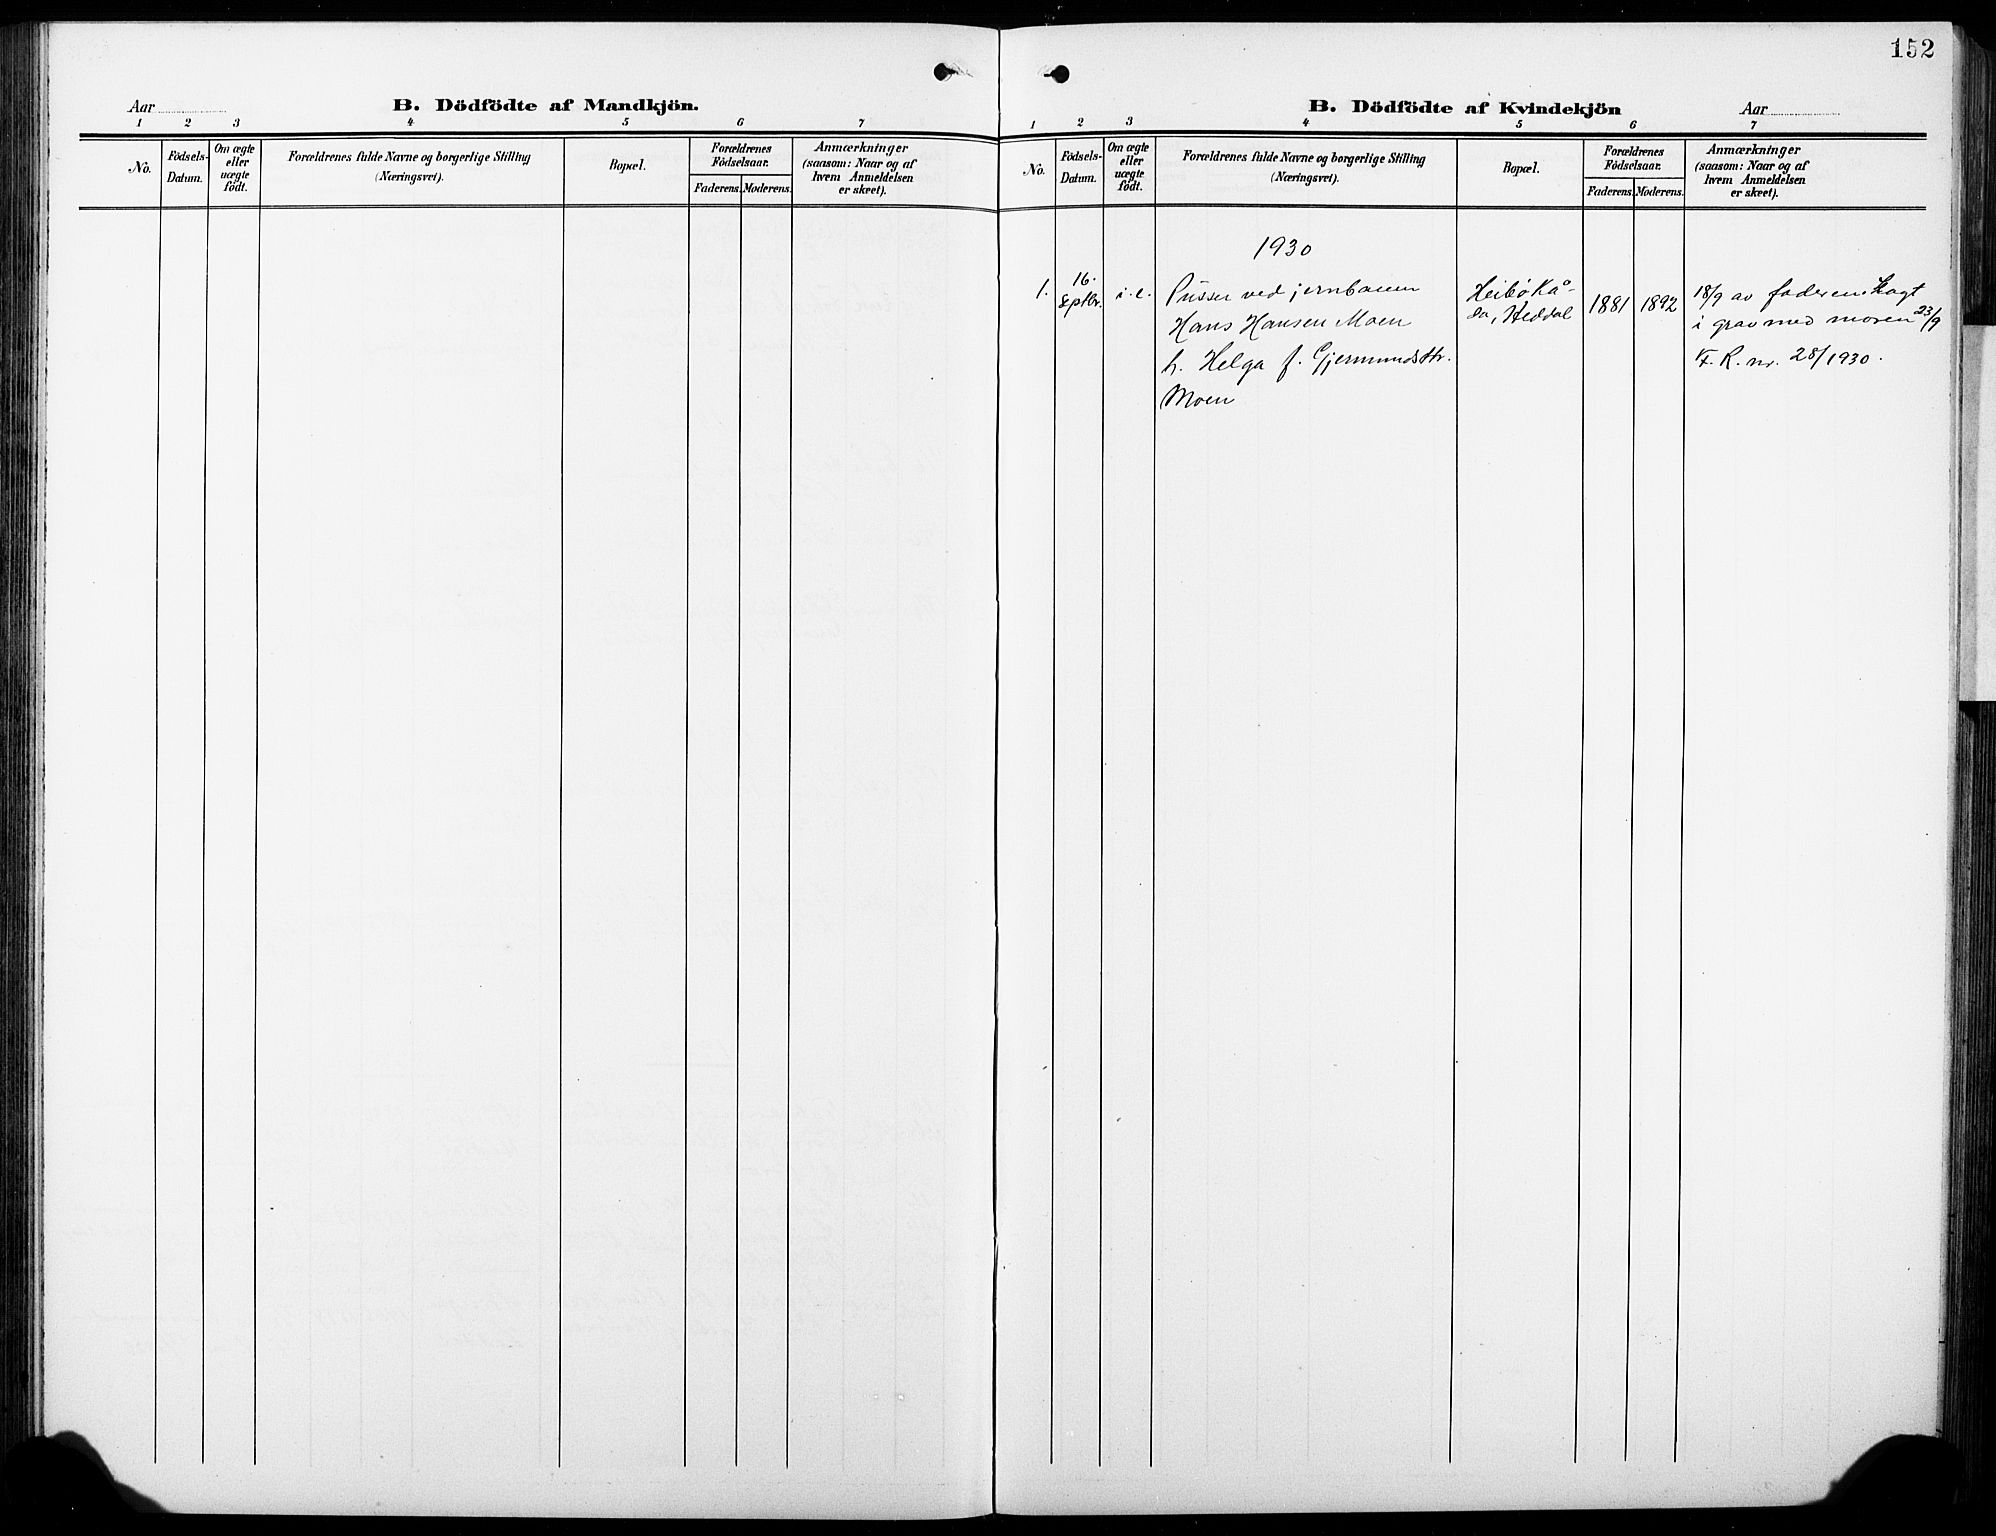 SAKO, Heddal kirkebøker, G/Ga/L0003: Klokkerbok nr. I 3, 1908-1932, s. 152